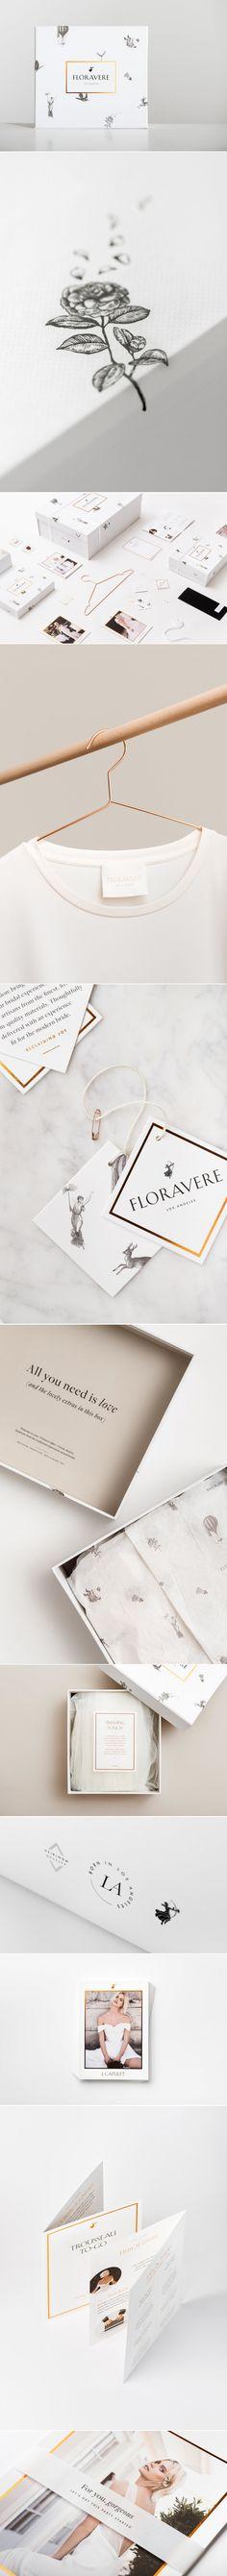 Floravere Wedding Gowns — The Dieline - Branding & Packaging Design